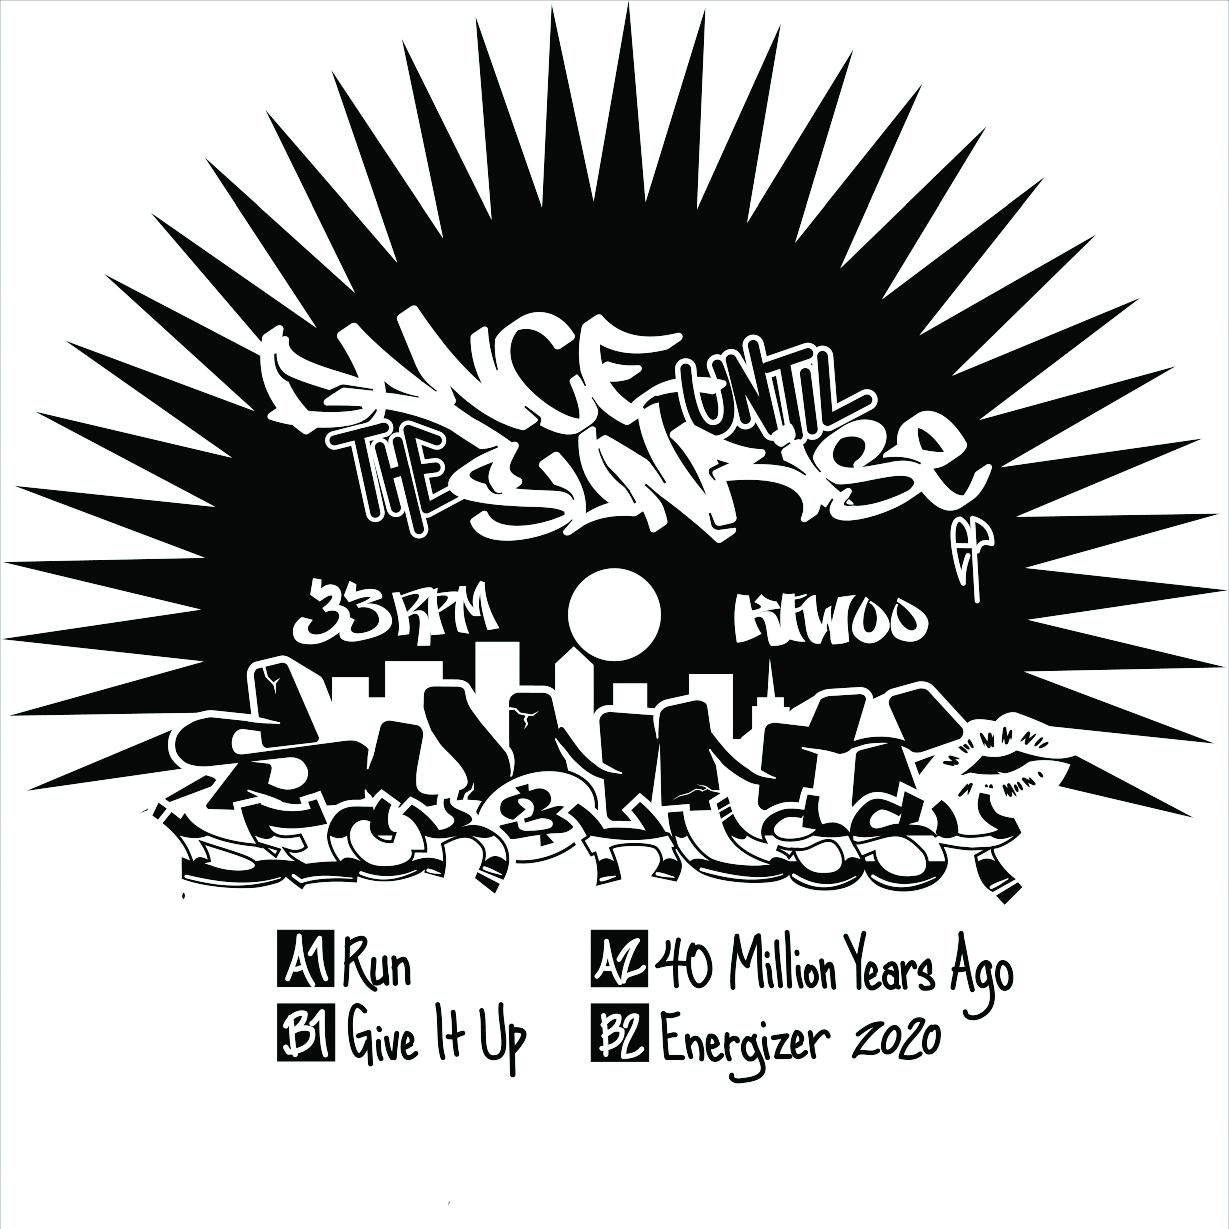 "[KFW00] Sunny & Deck Hussy - Dance until the Sunrise EP (12"" Vinyl + Digital)"